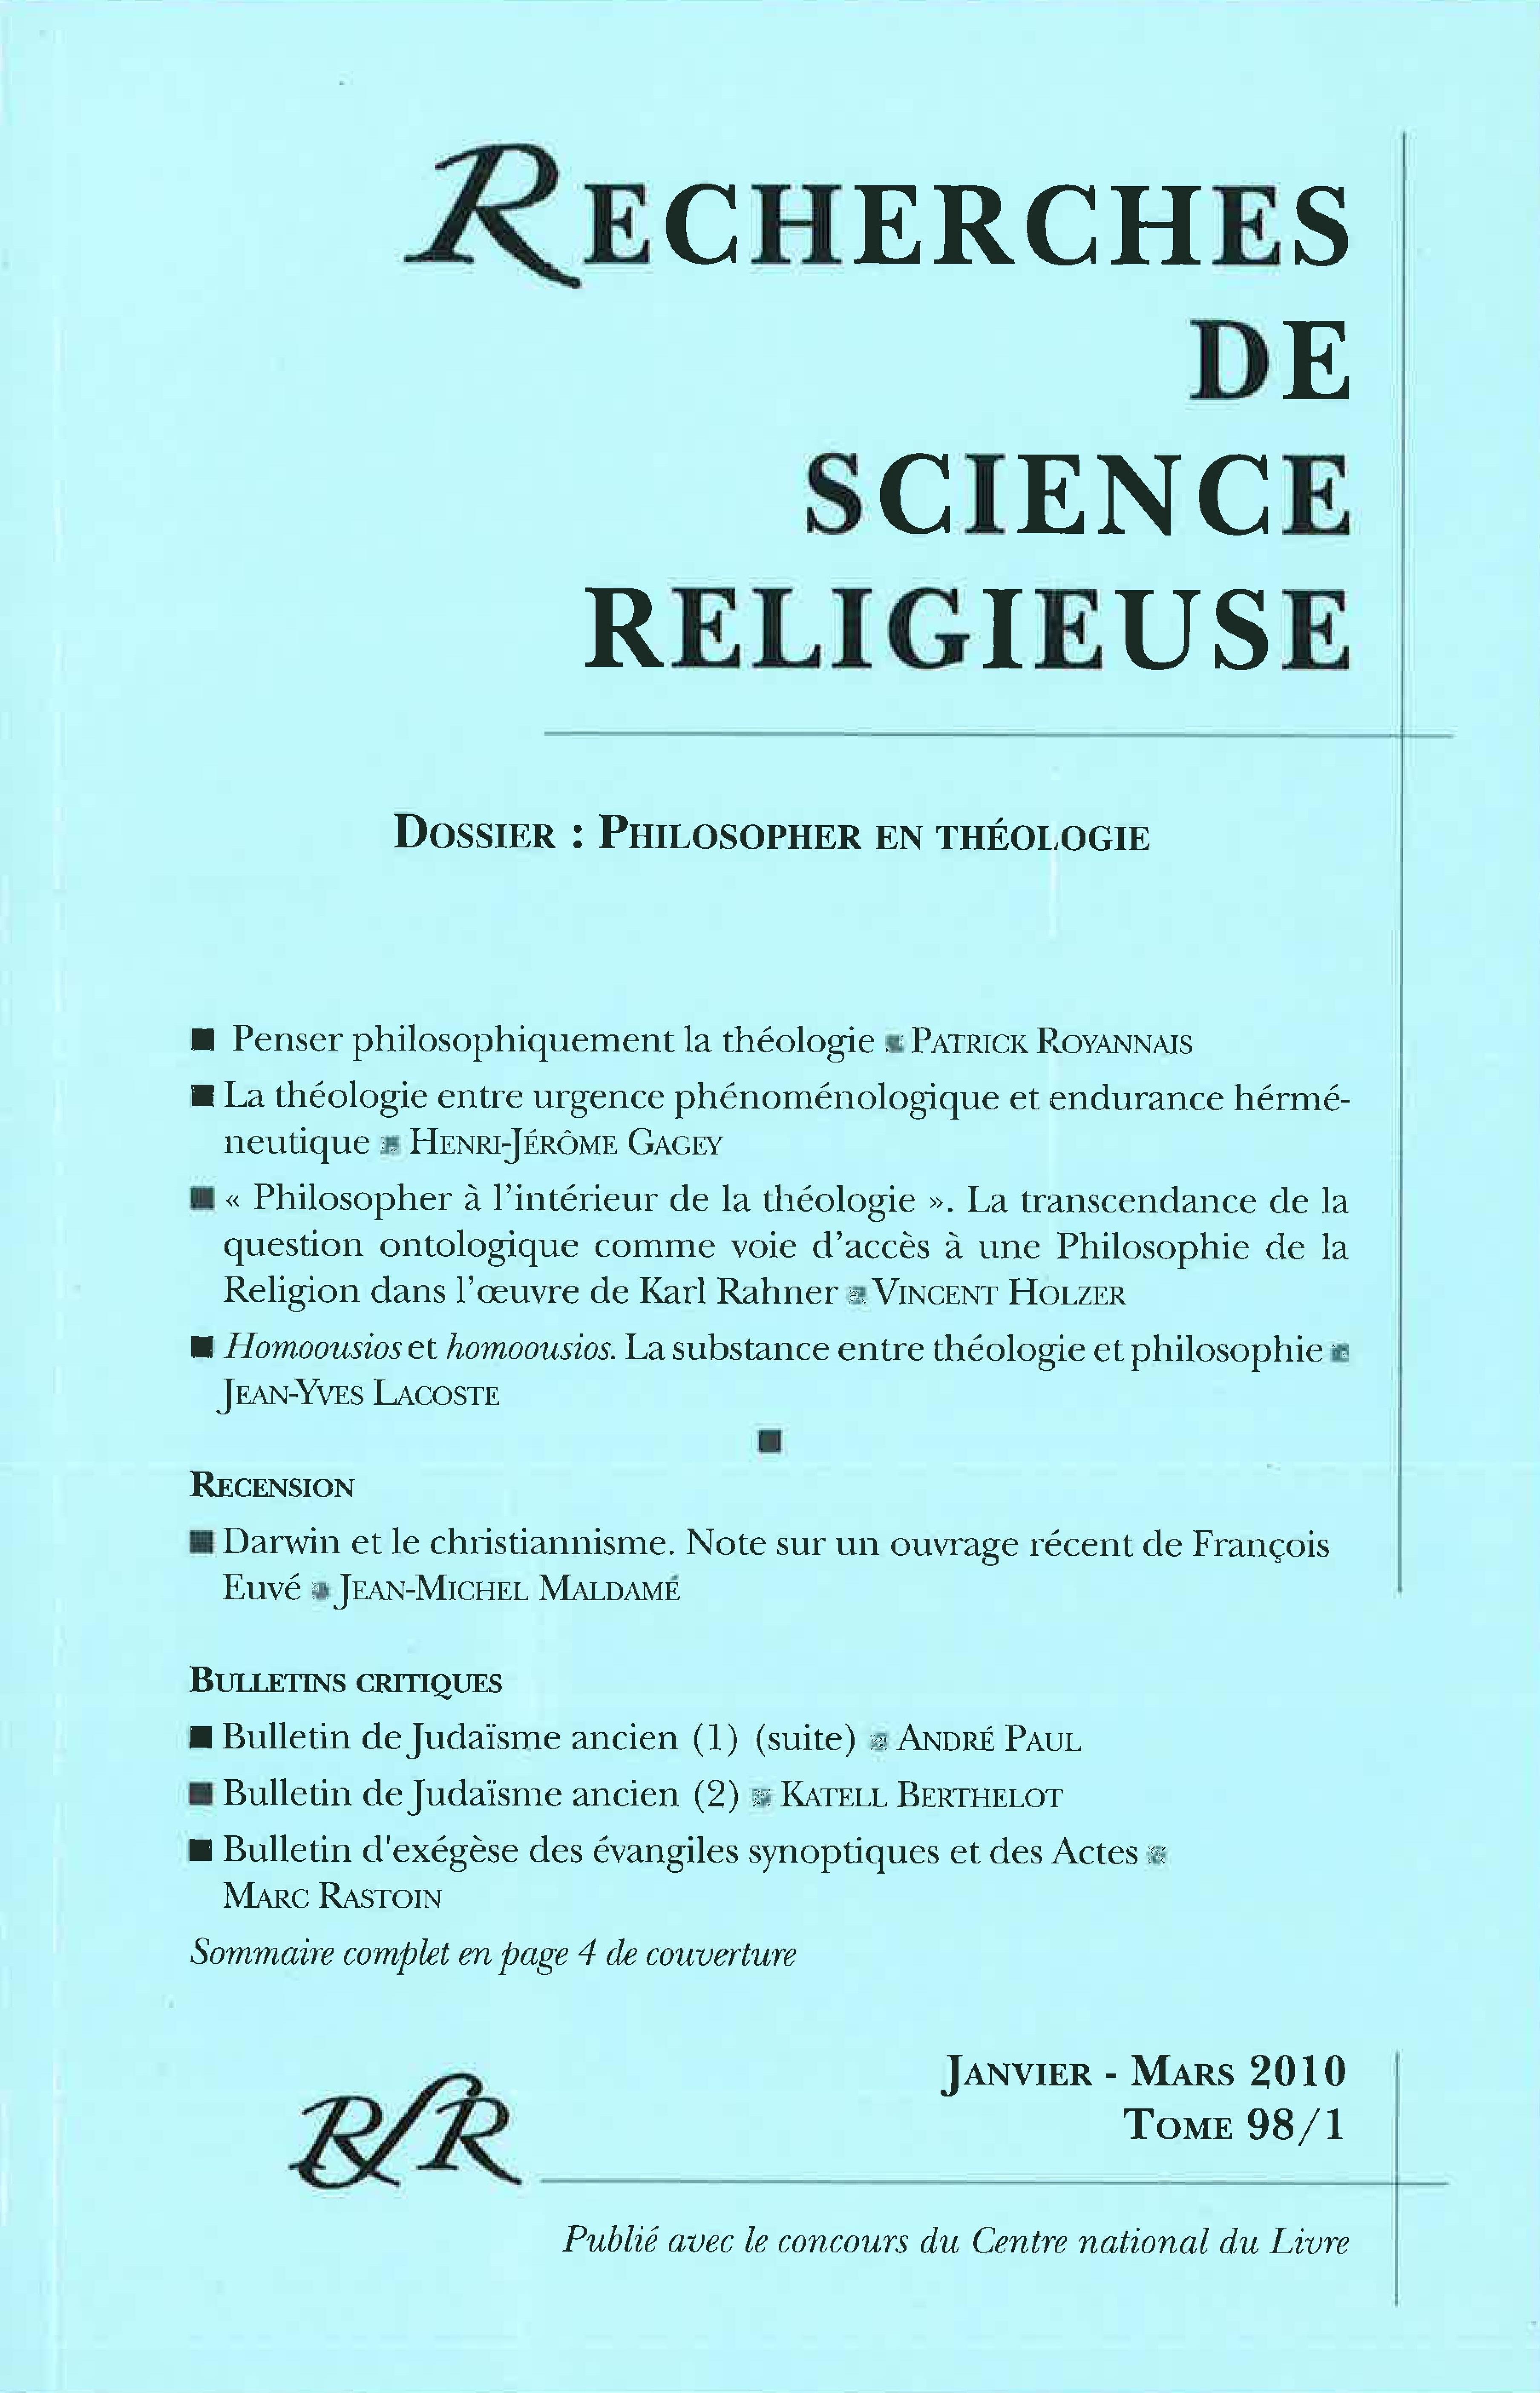 Bulletin de judaïsme ancien (2) | Cairn.info